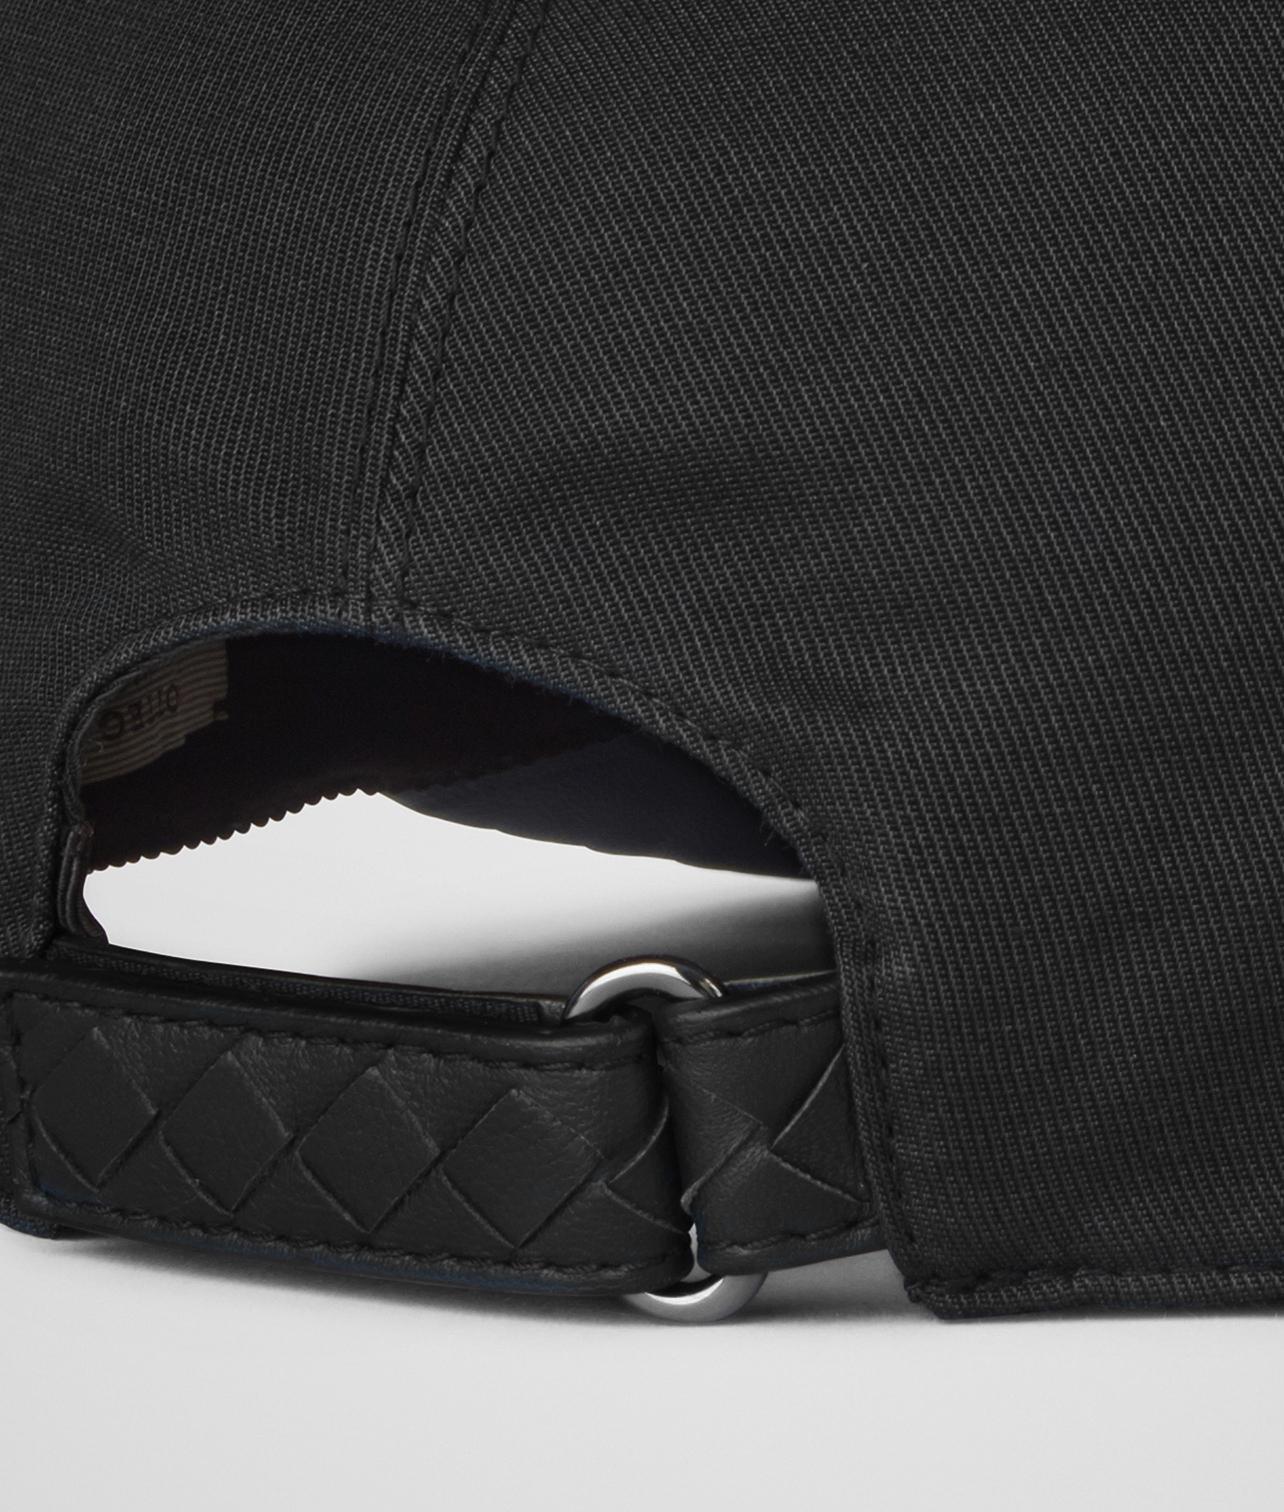 8188298bba1a Lyst - Bottega Veneta Nero Cotton nappa Hat in Black for Men